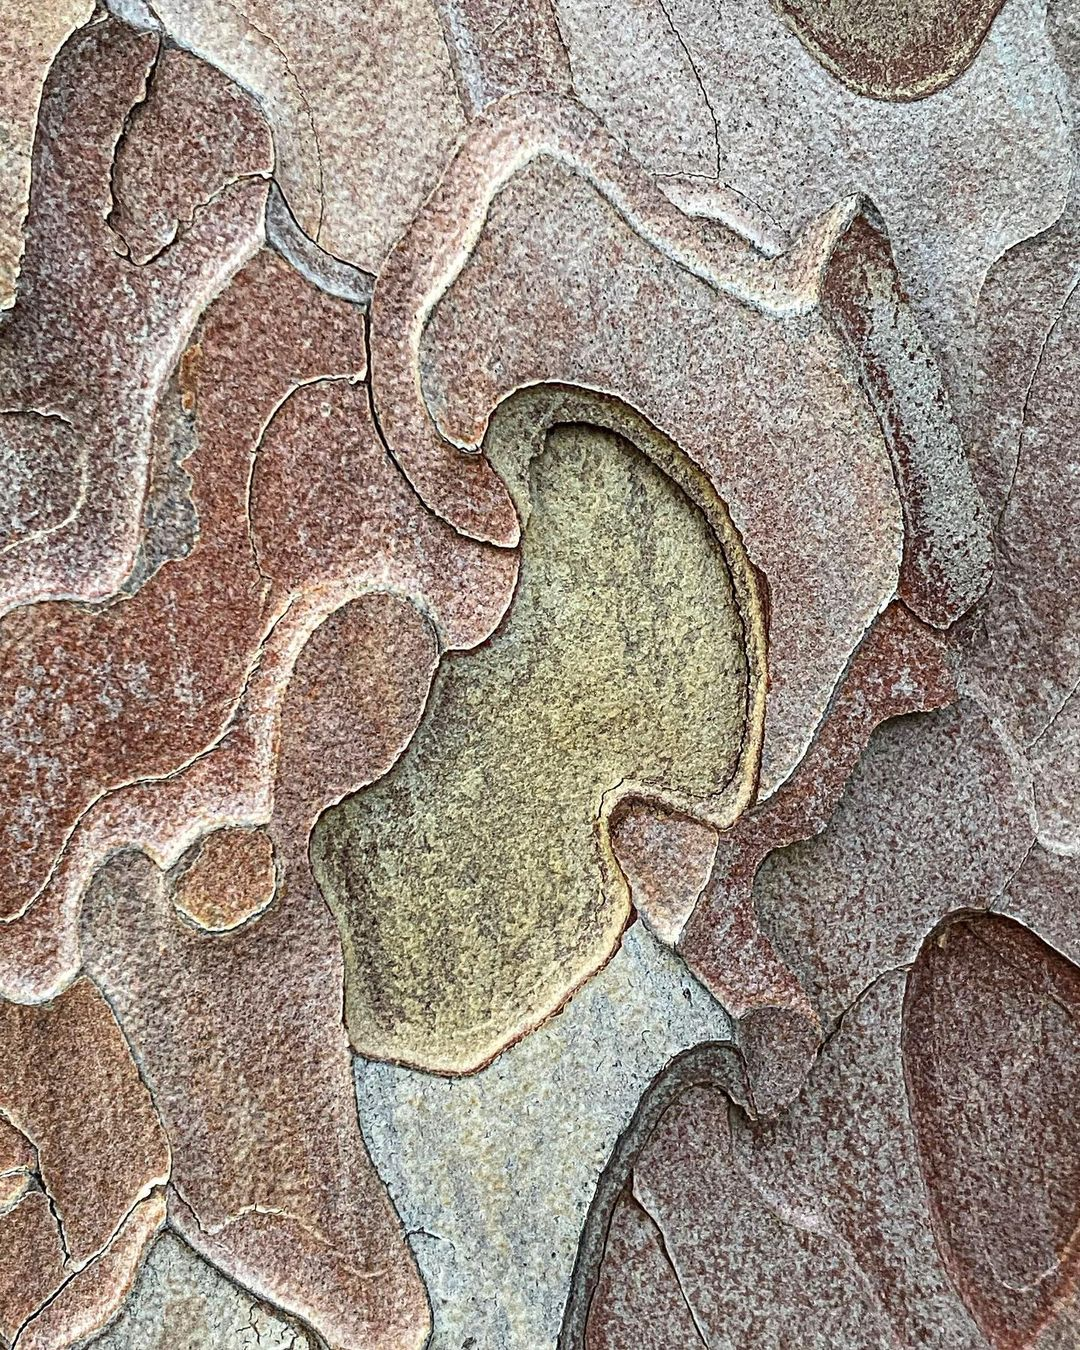 Donwload Photo Kaligrafi Çam ağacı kabuğu. Modern sanatın ilham kaynağı mı?…- ozcay